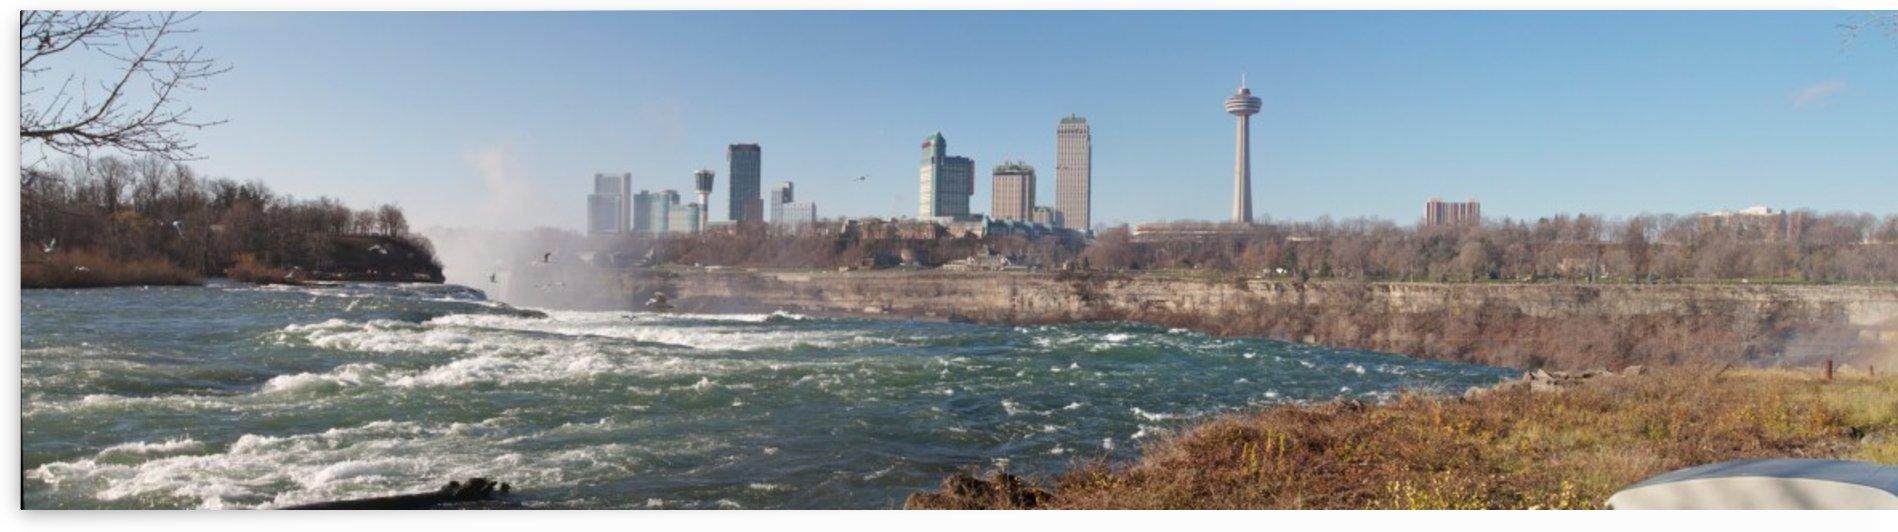 Top of Niagara Falls  by William Norton Photography